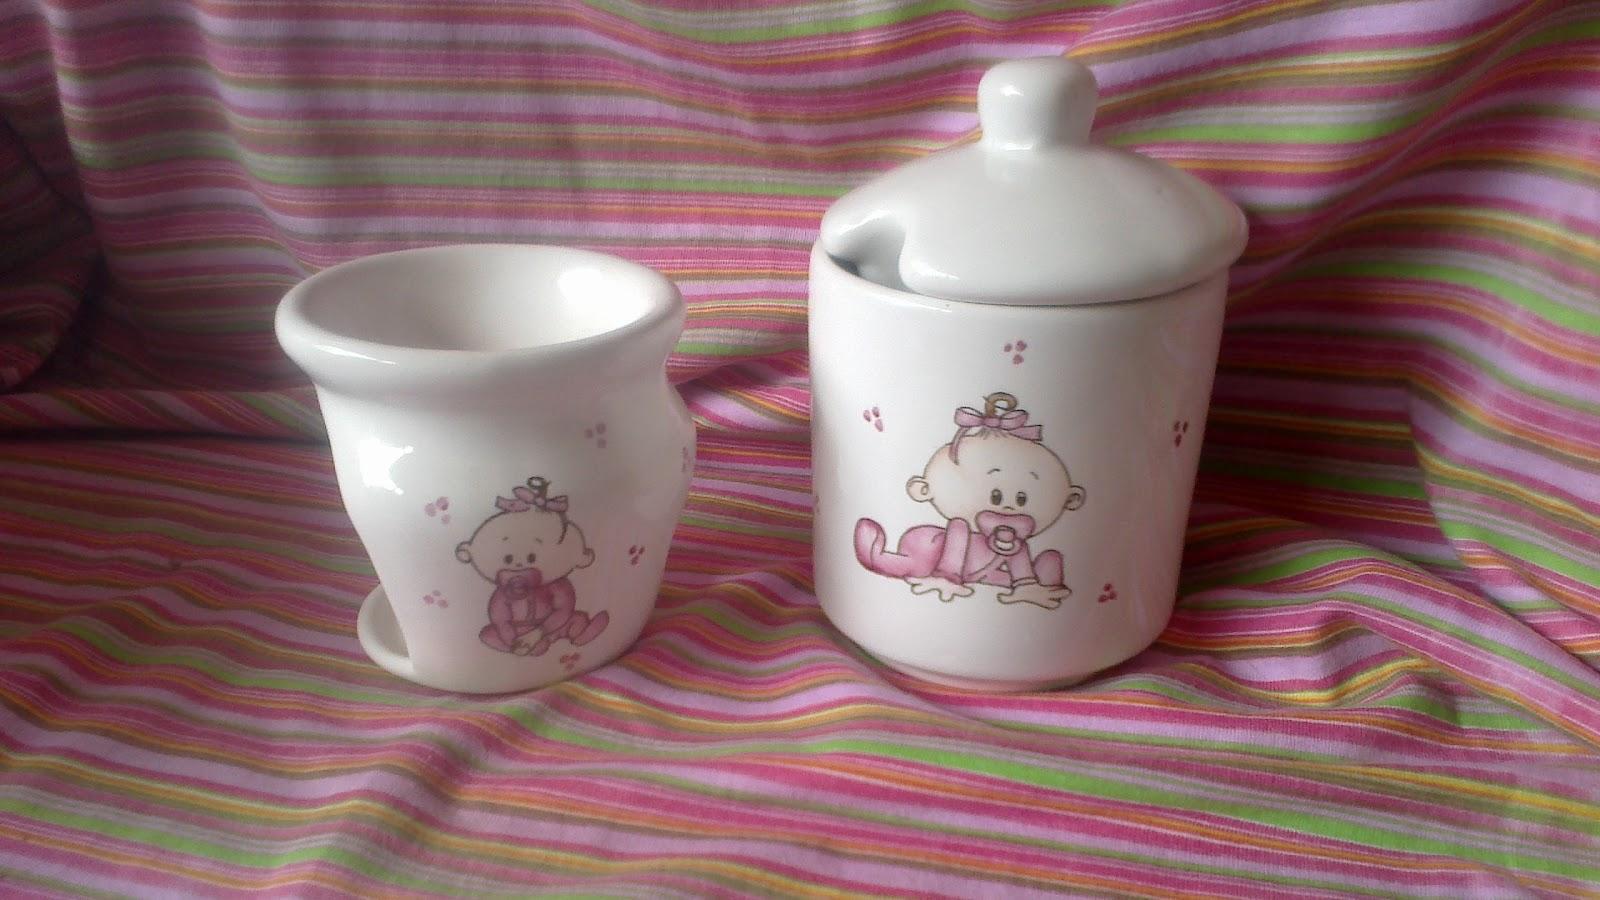 Set De Baño Souvenirs: Magica – Porcelana Pintada a Mano: Bautismo y Primer Añito souvenirs